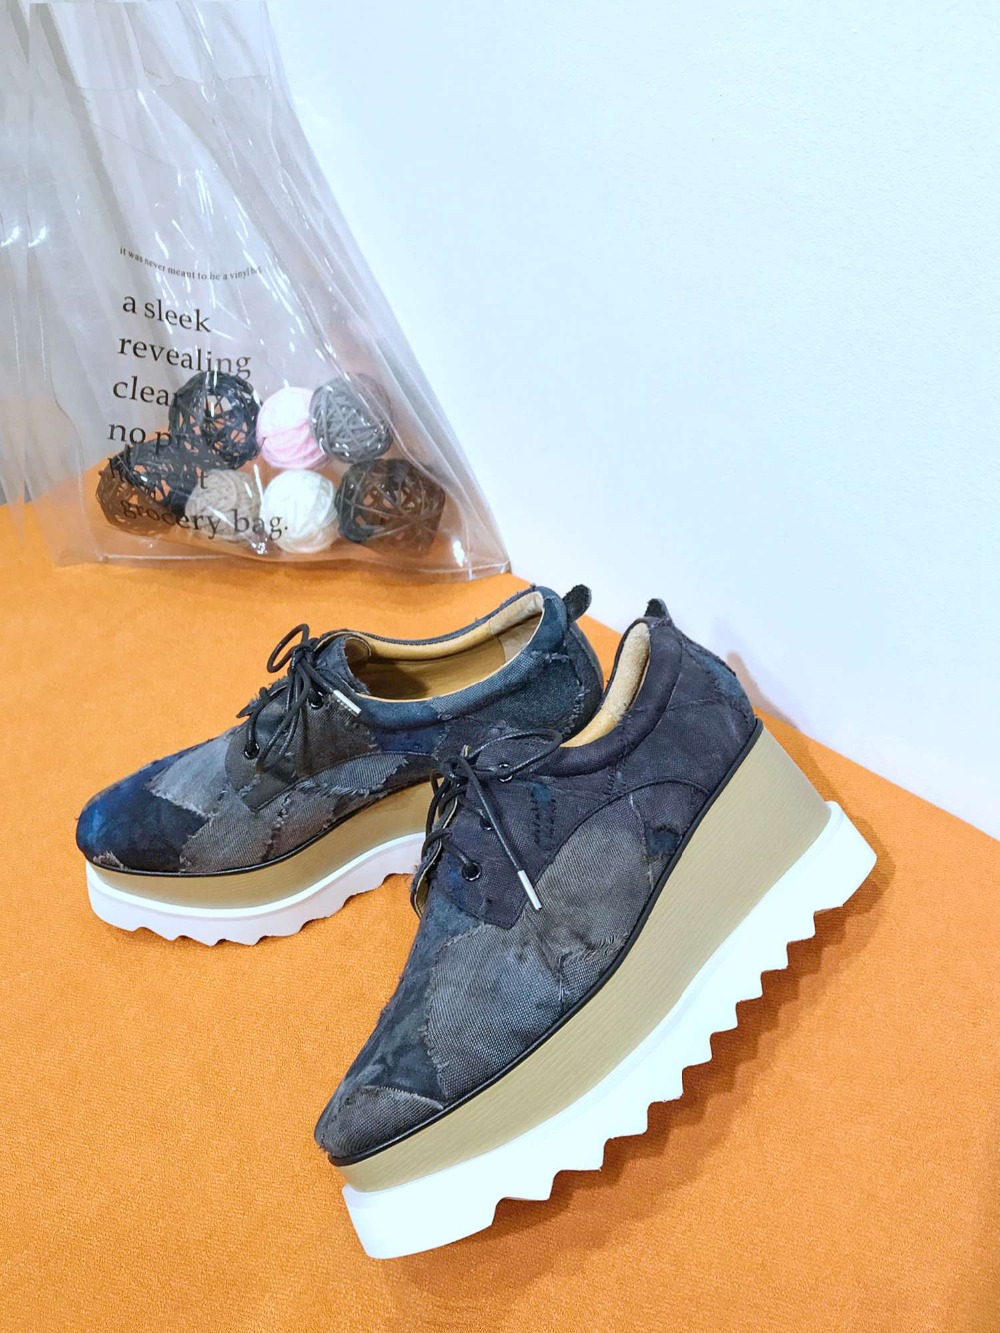 Novo Estilo Casual Vestido Ladies Handicrafted Sandálias De Salto Alto Borla Tiras Peep toe Festa de Formatura Namoro Sapatos de Compras A120 - 4